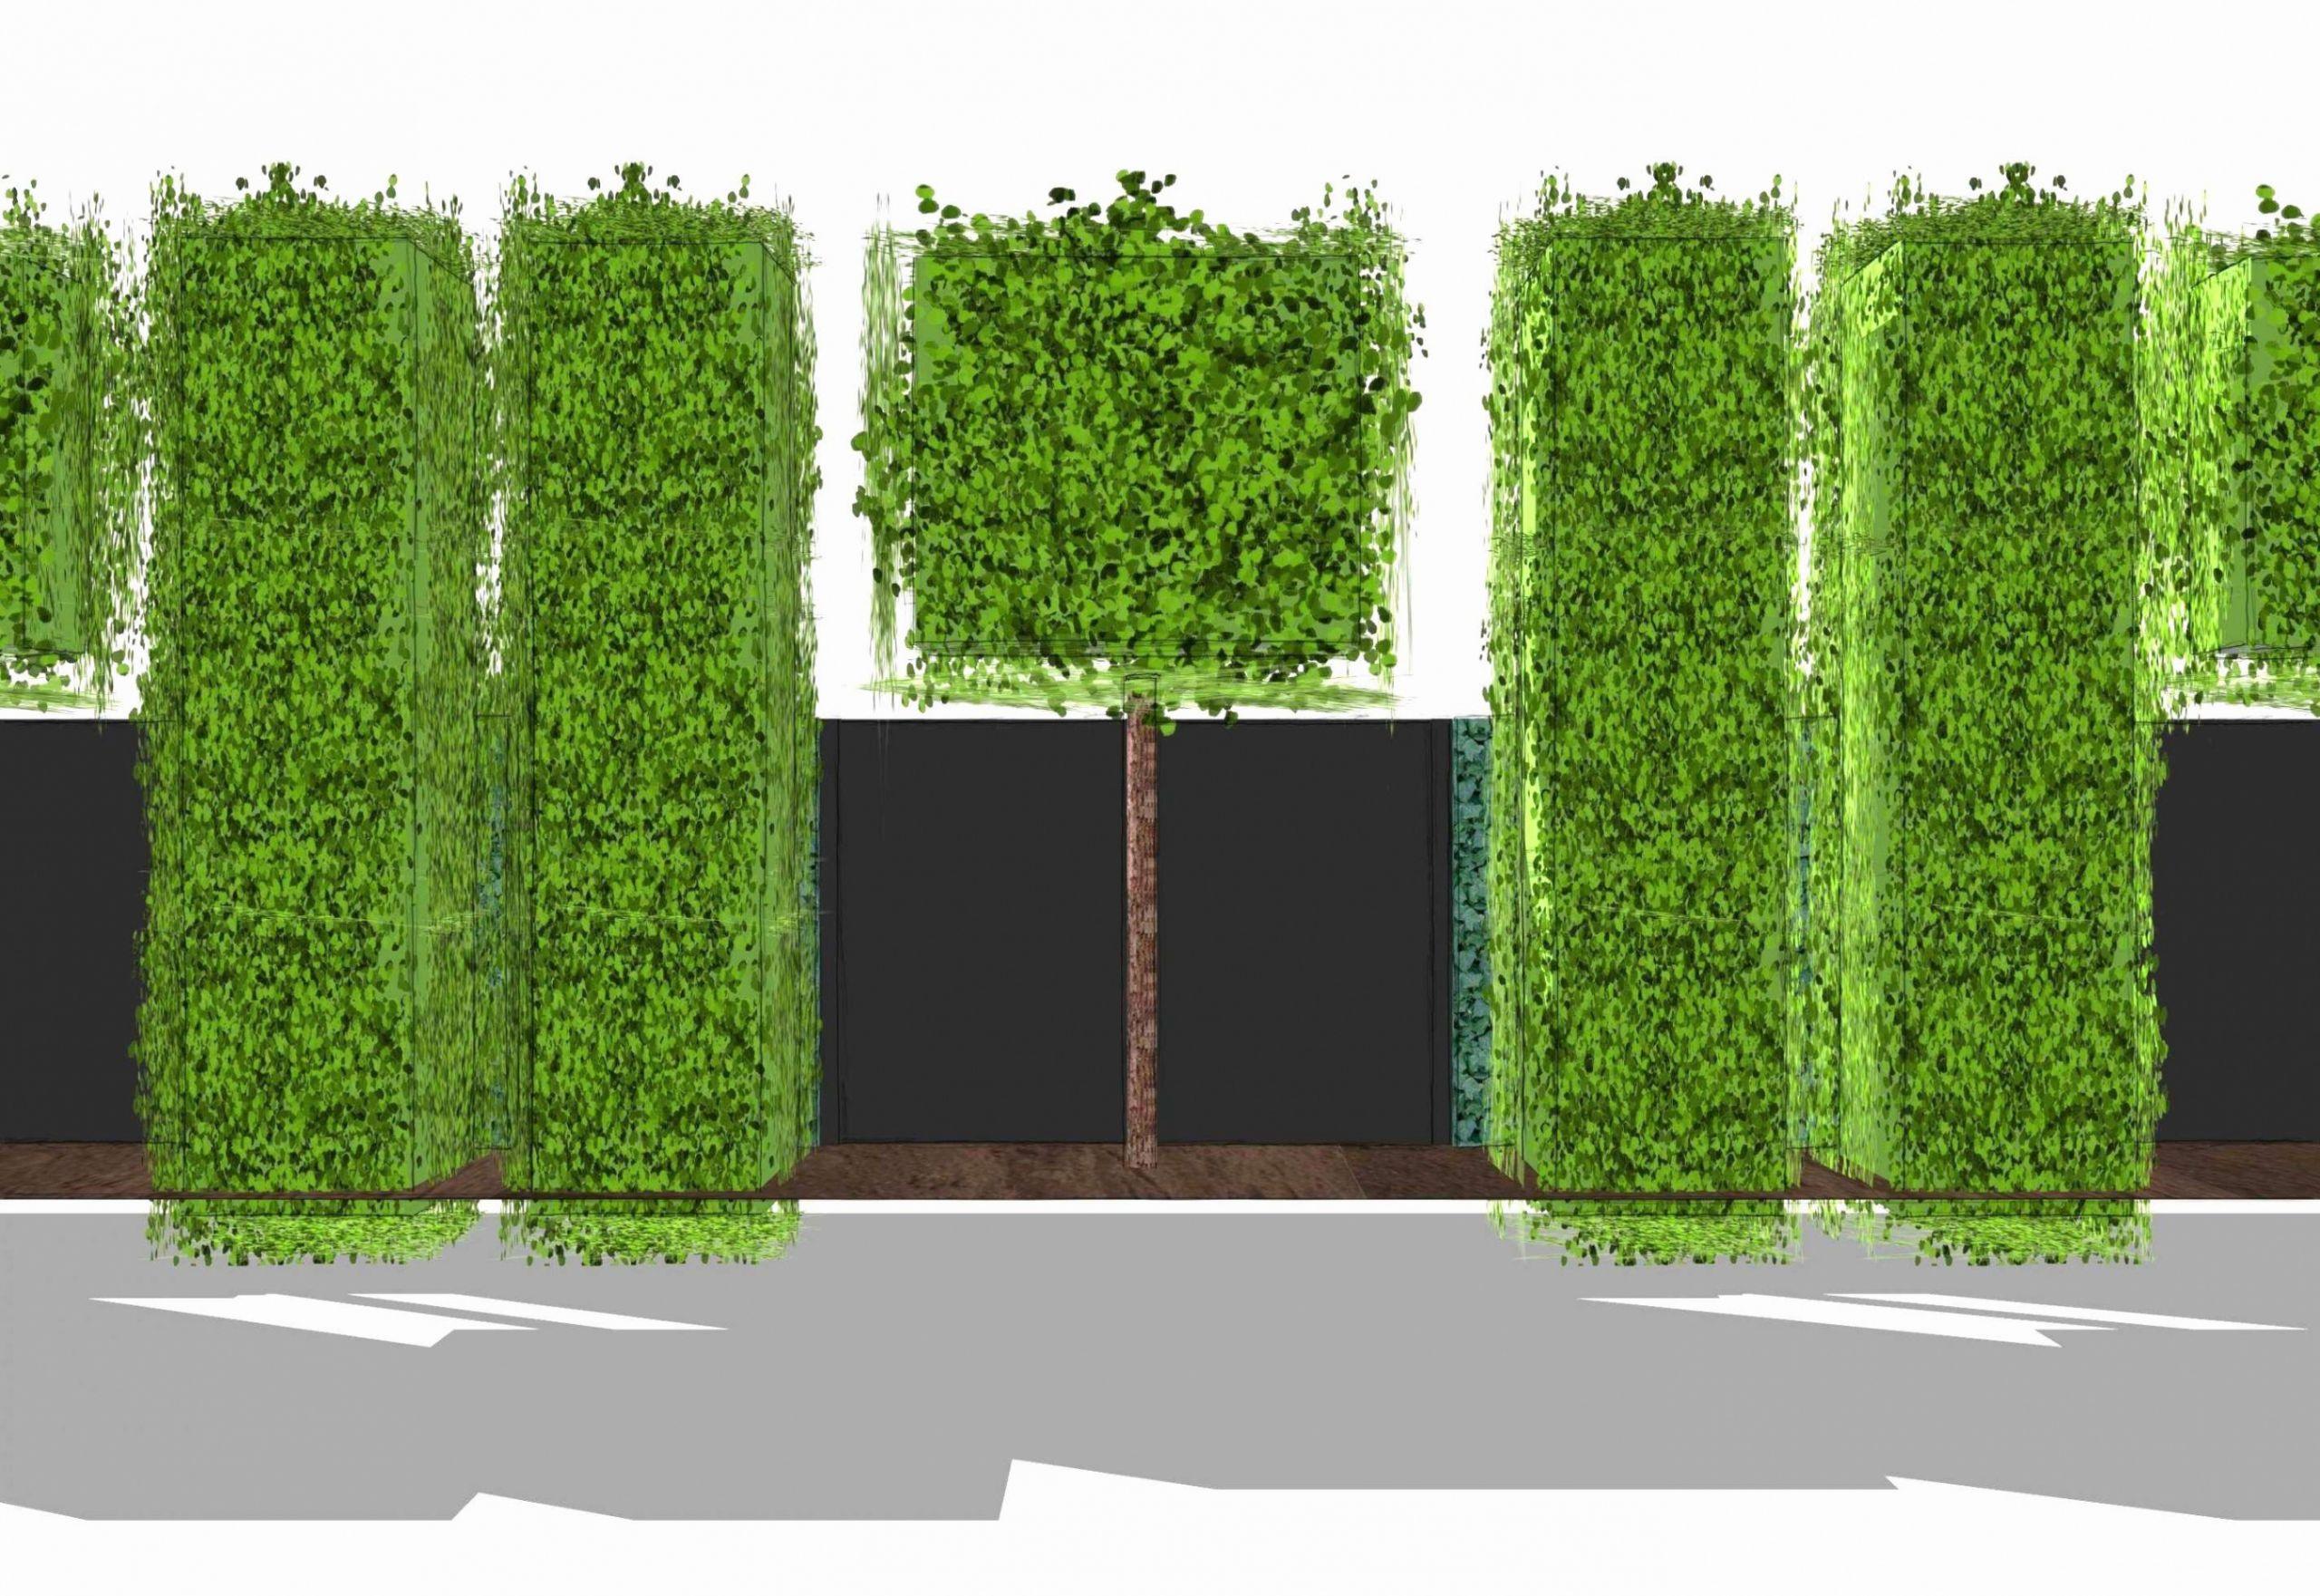 gabionen gartengestaltung neu garten ideas zaun garten zaun garten gabionen gartengestaltung bilder gabionen gartengestaltung bilder